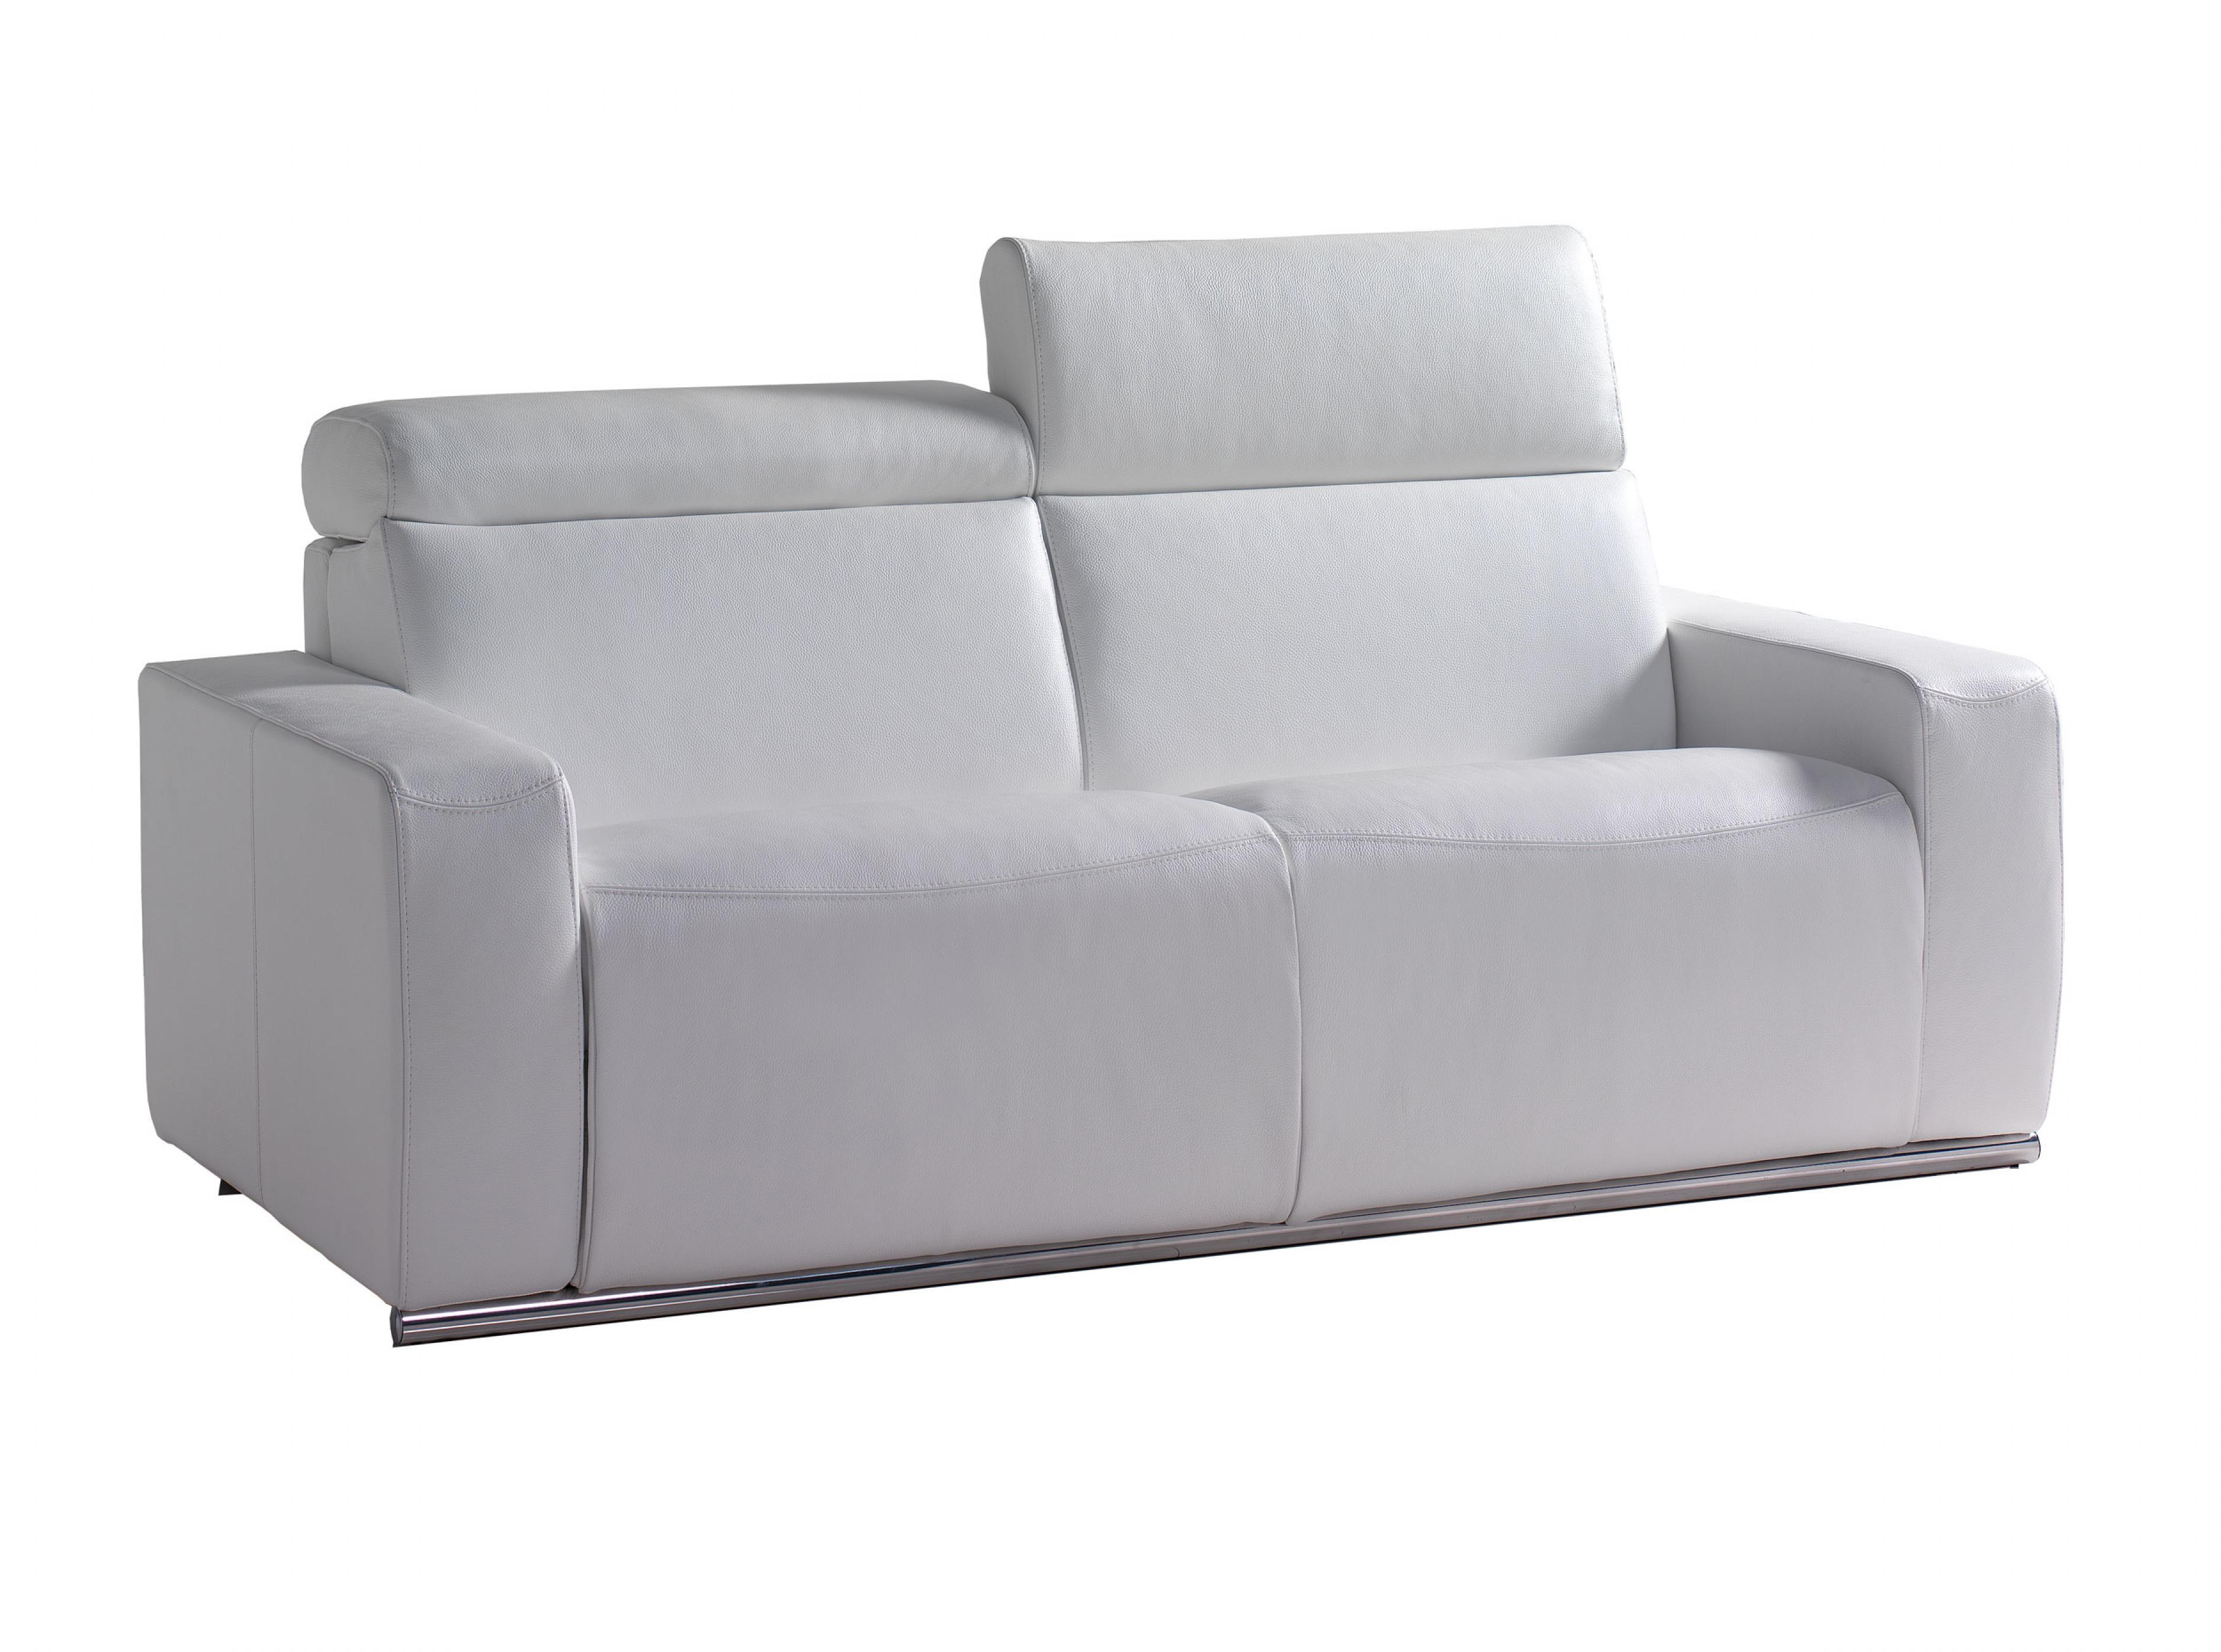 photos canap lit design italien. Black Bedroom Furniture Sets. Home Design Ideas